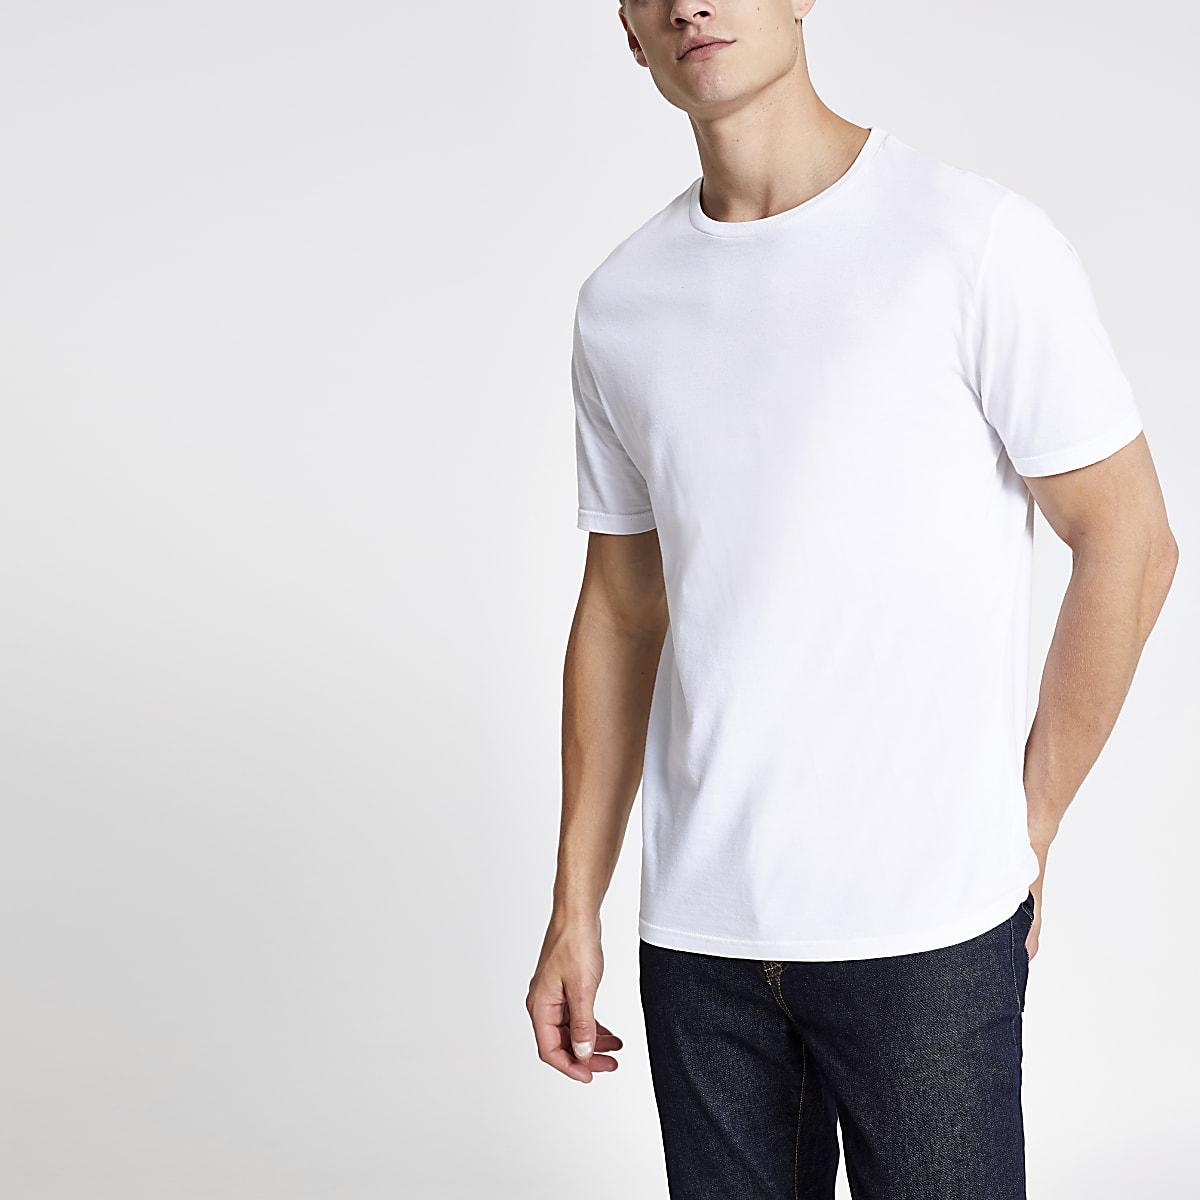 572fba9d1ed21d ... Rundhalsausschnitt Weißes Slim Fit T-Shirt mit Rundhalsausschnitt ...